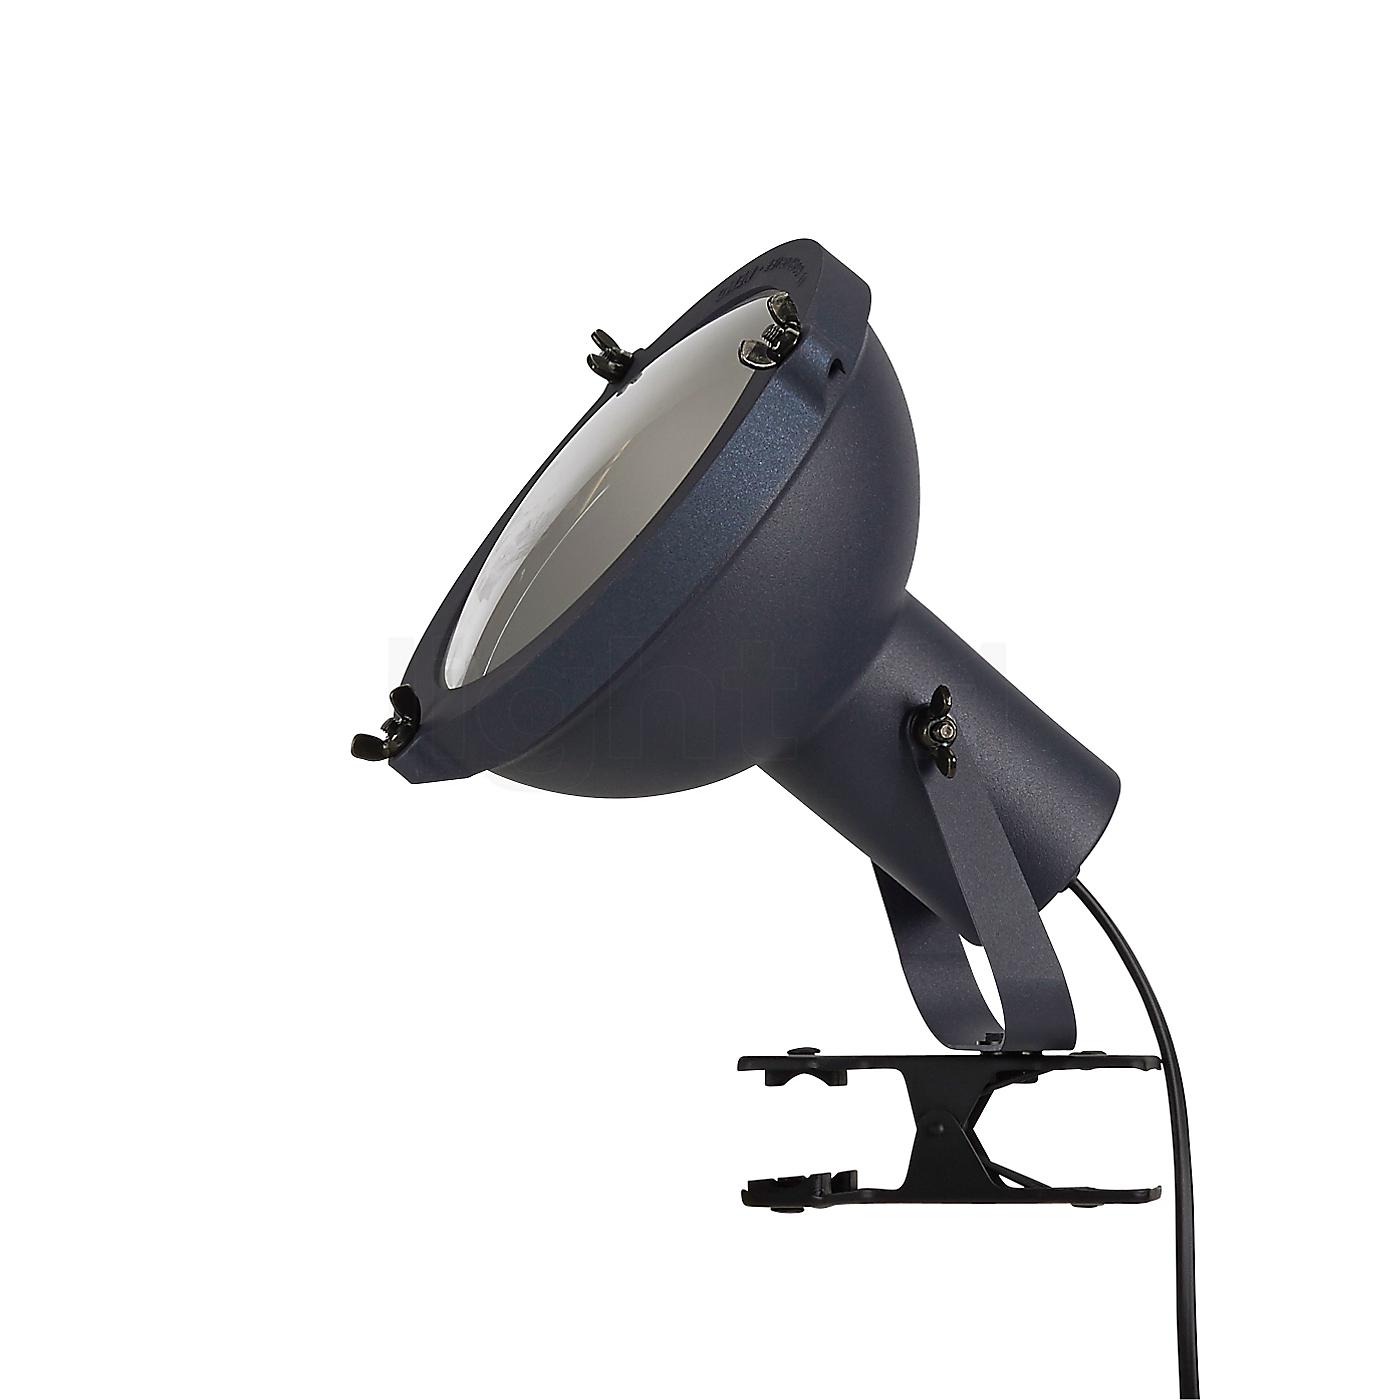 nemo projecteur 165 mini klemmleuchte klemmleuchte kaufen bei. Black Bedroom Furniture Sets. Home Design Ideas